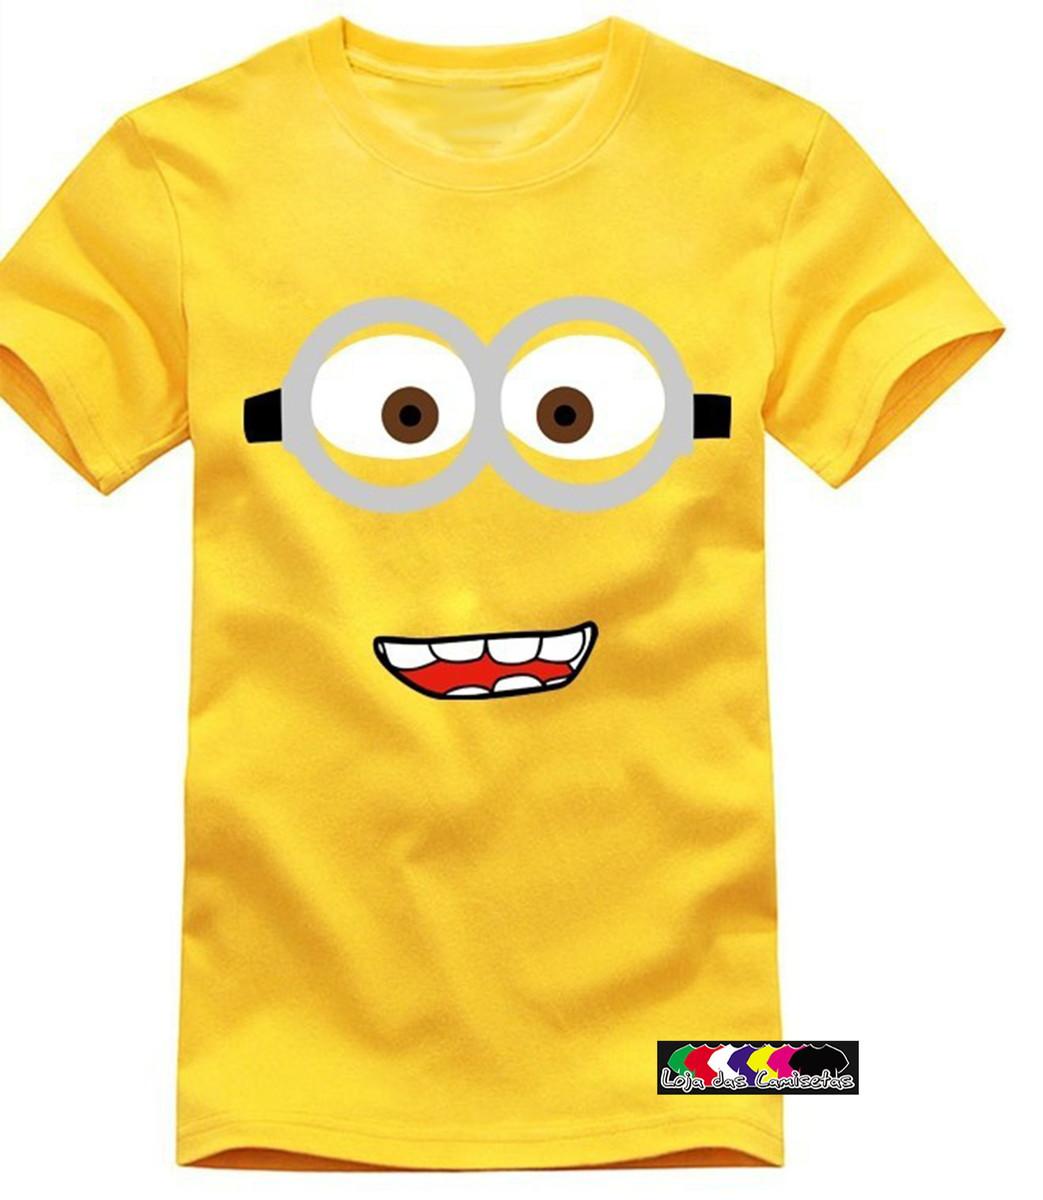 Zoom · Camiseta Minions sorrindo camiseta-minions-sorrindo-camisetas -customisadas 7261d4fecc0